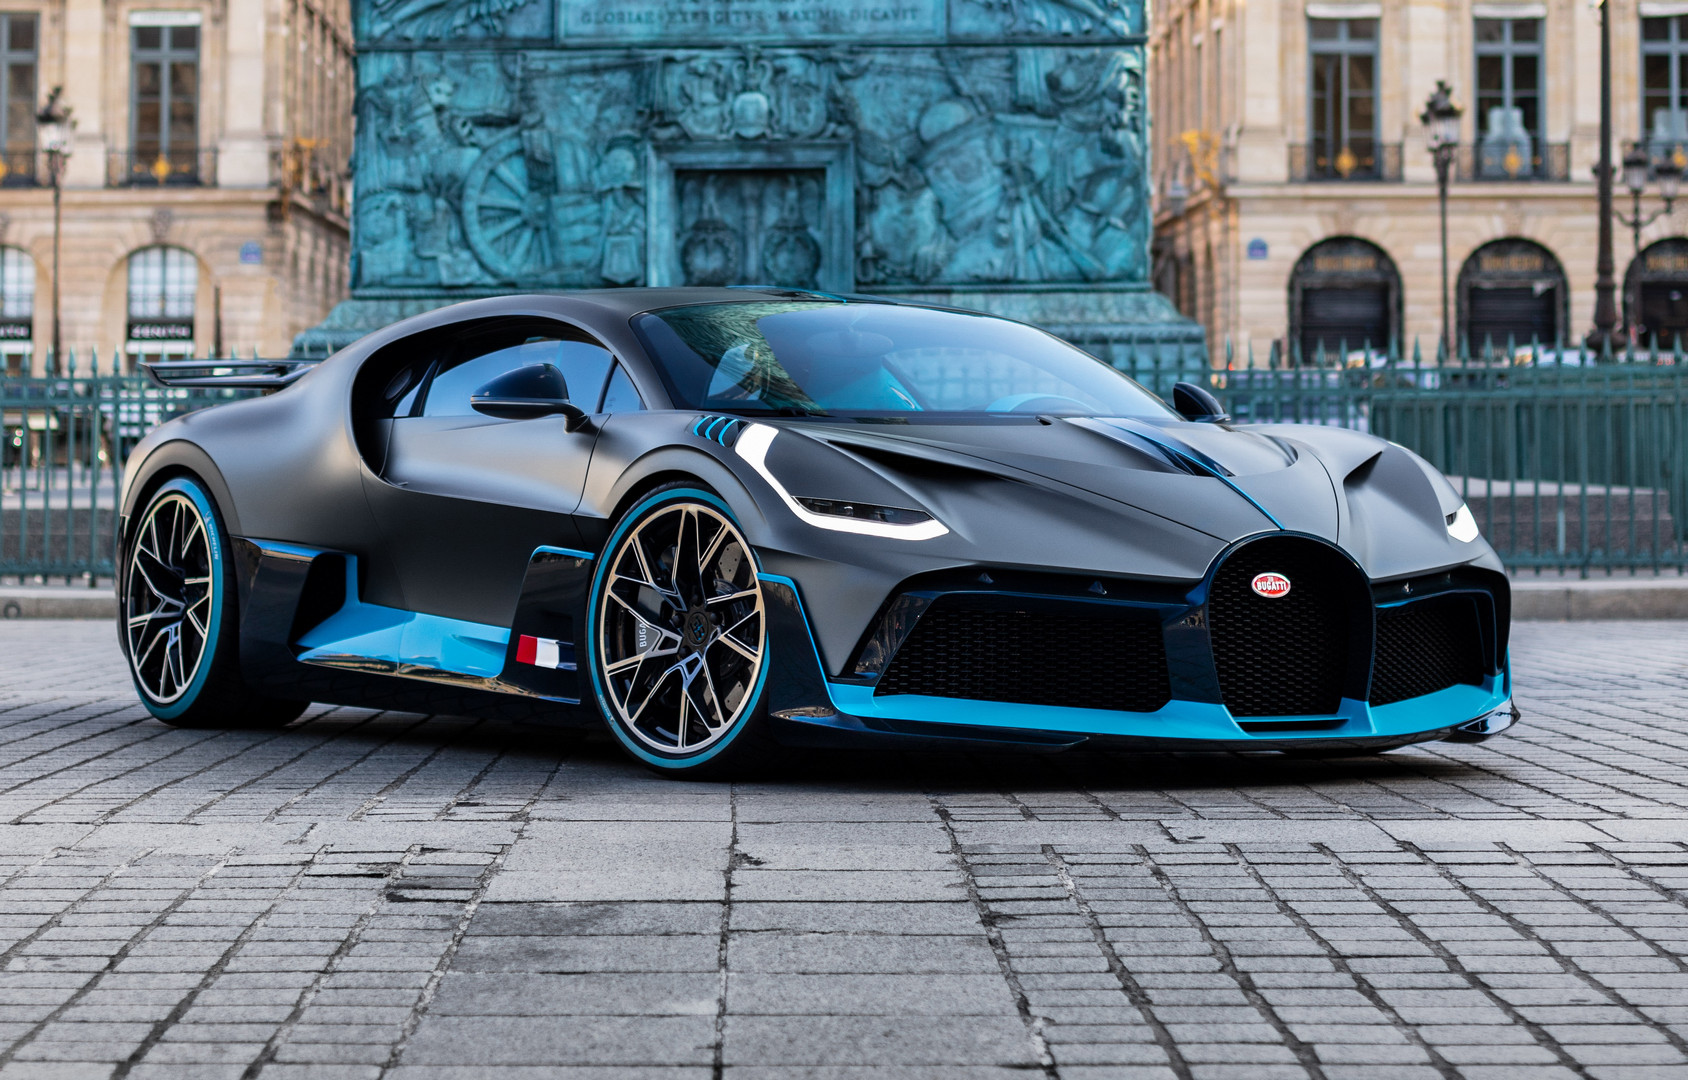 Bugatti to Reveal New Models in 2019, Denies SUV Rumors - GTspirit